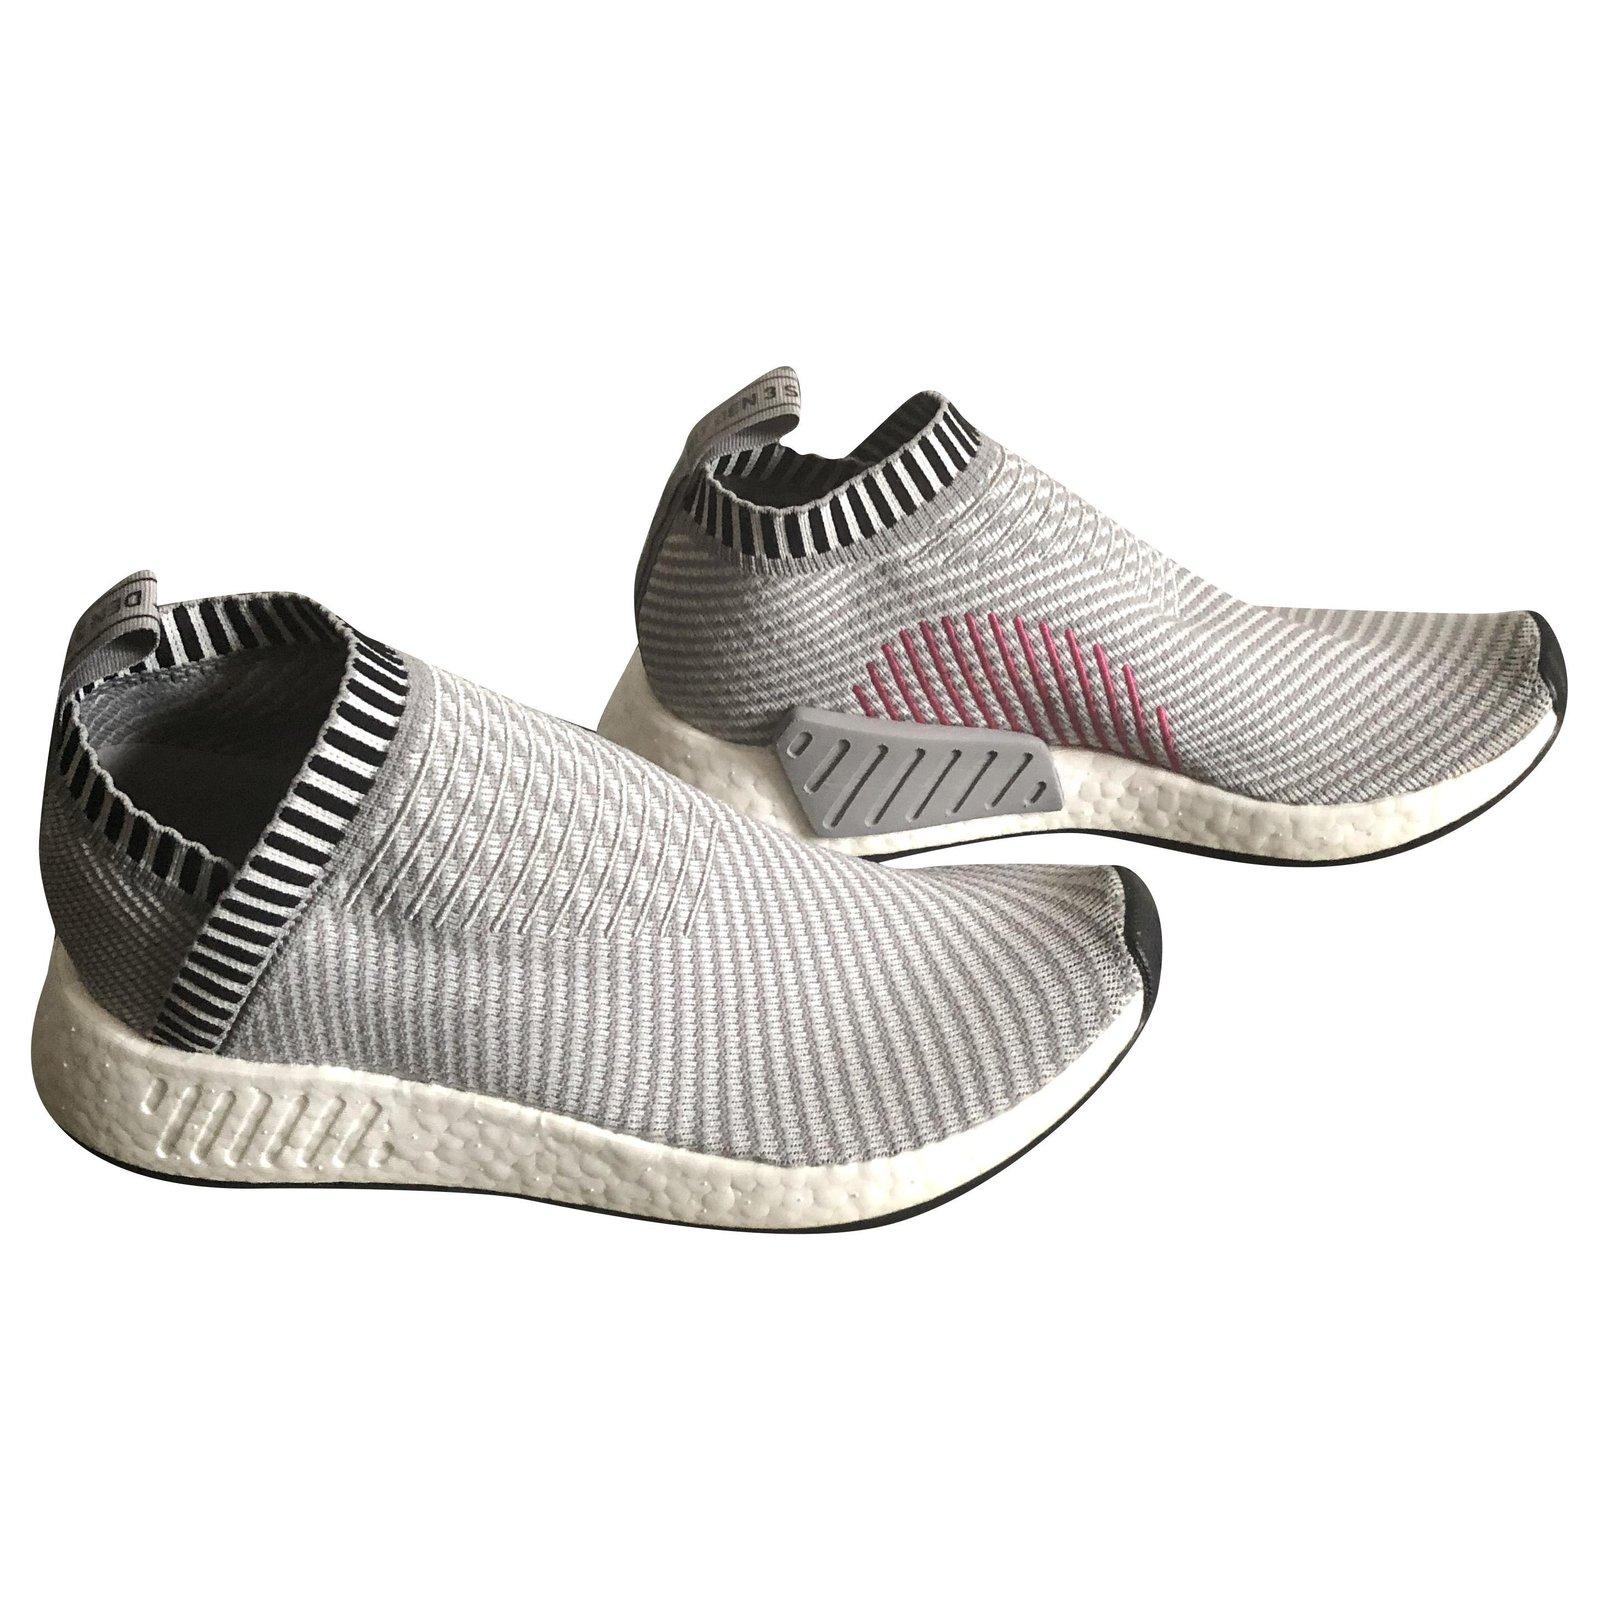 Adidas NMD slip-on gray size 42 2/3